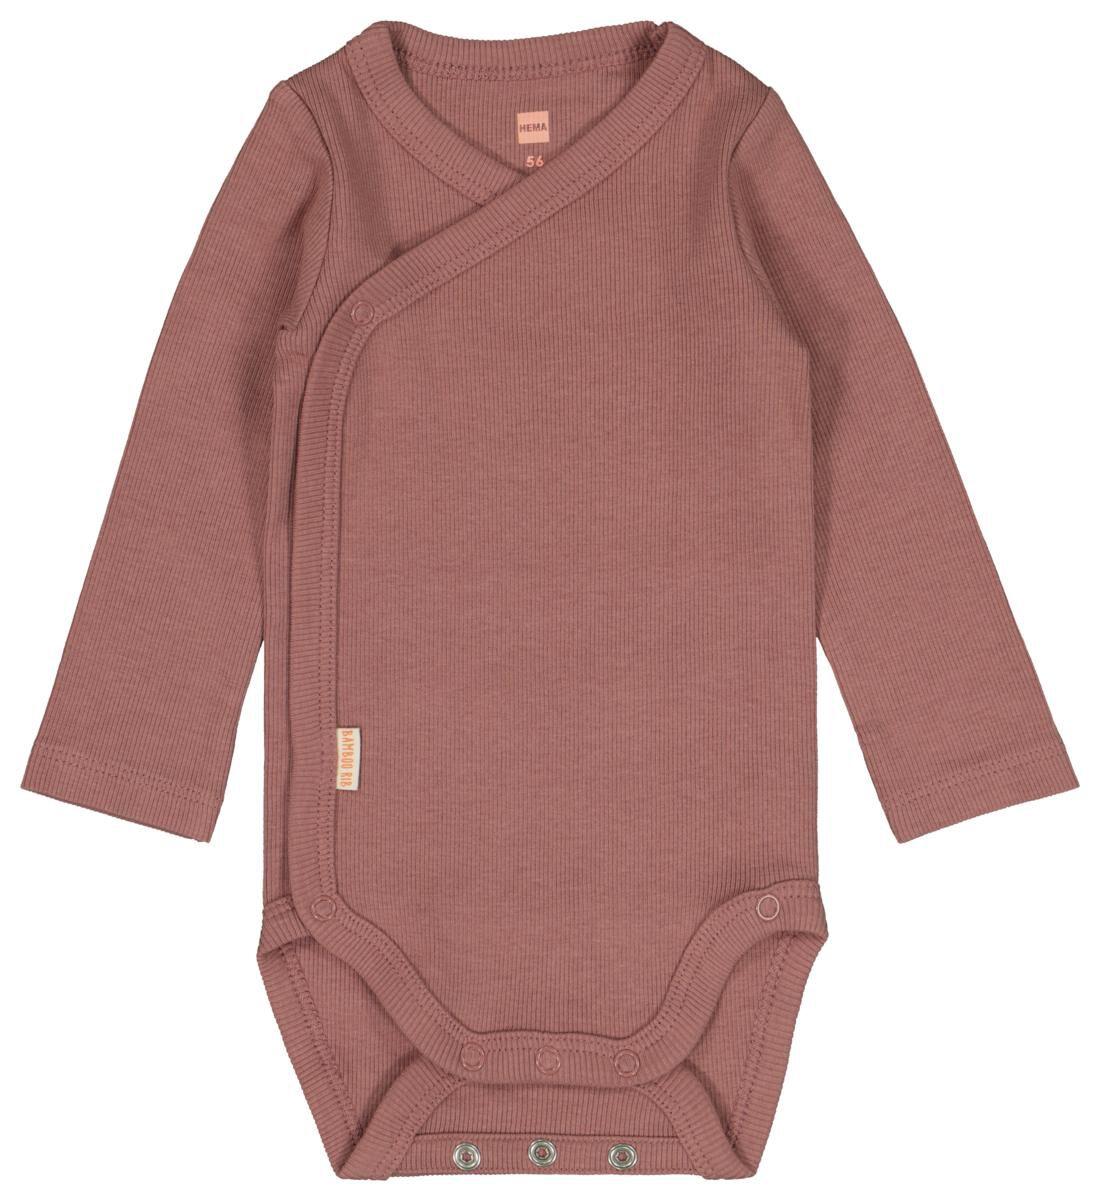 HEMA Newborn-prematuur Overslagromper Rib Bamboe Stretch Roze (roze)